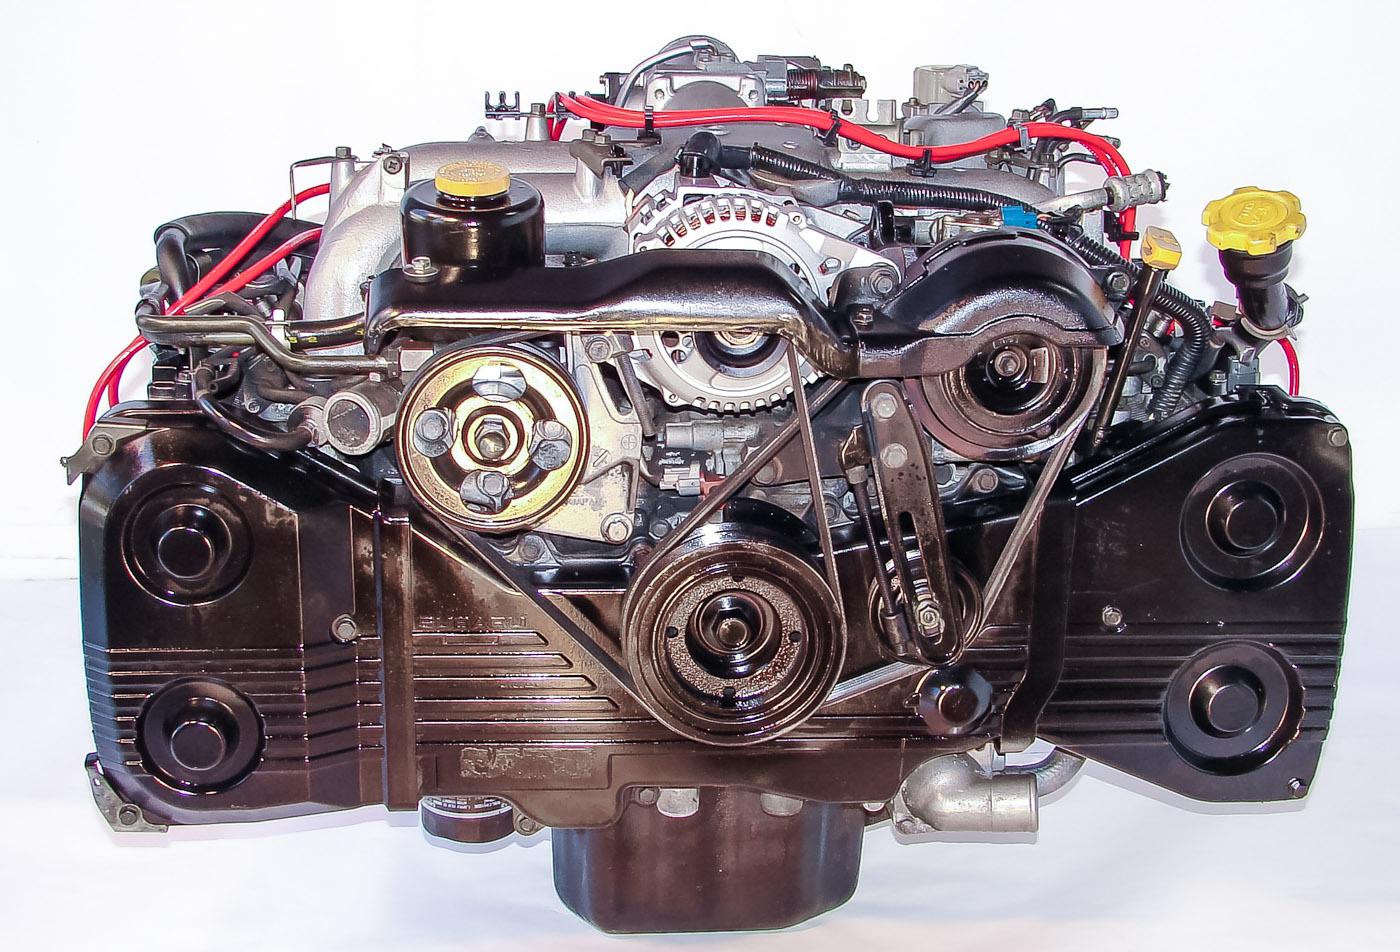 Subaru Ej Dohc Engine on 1996 Dodge Dakota 4x4 Transmission